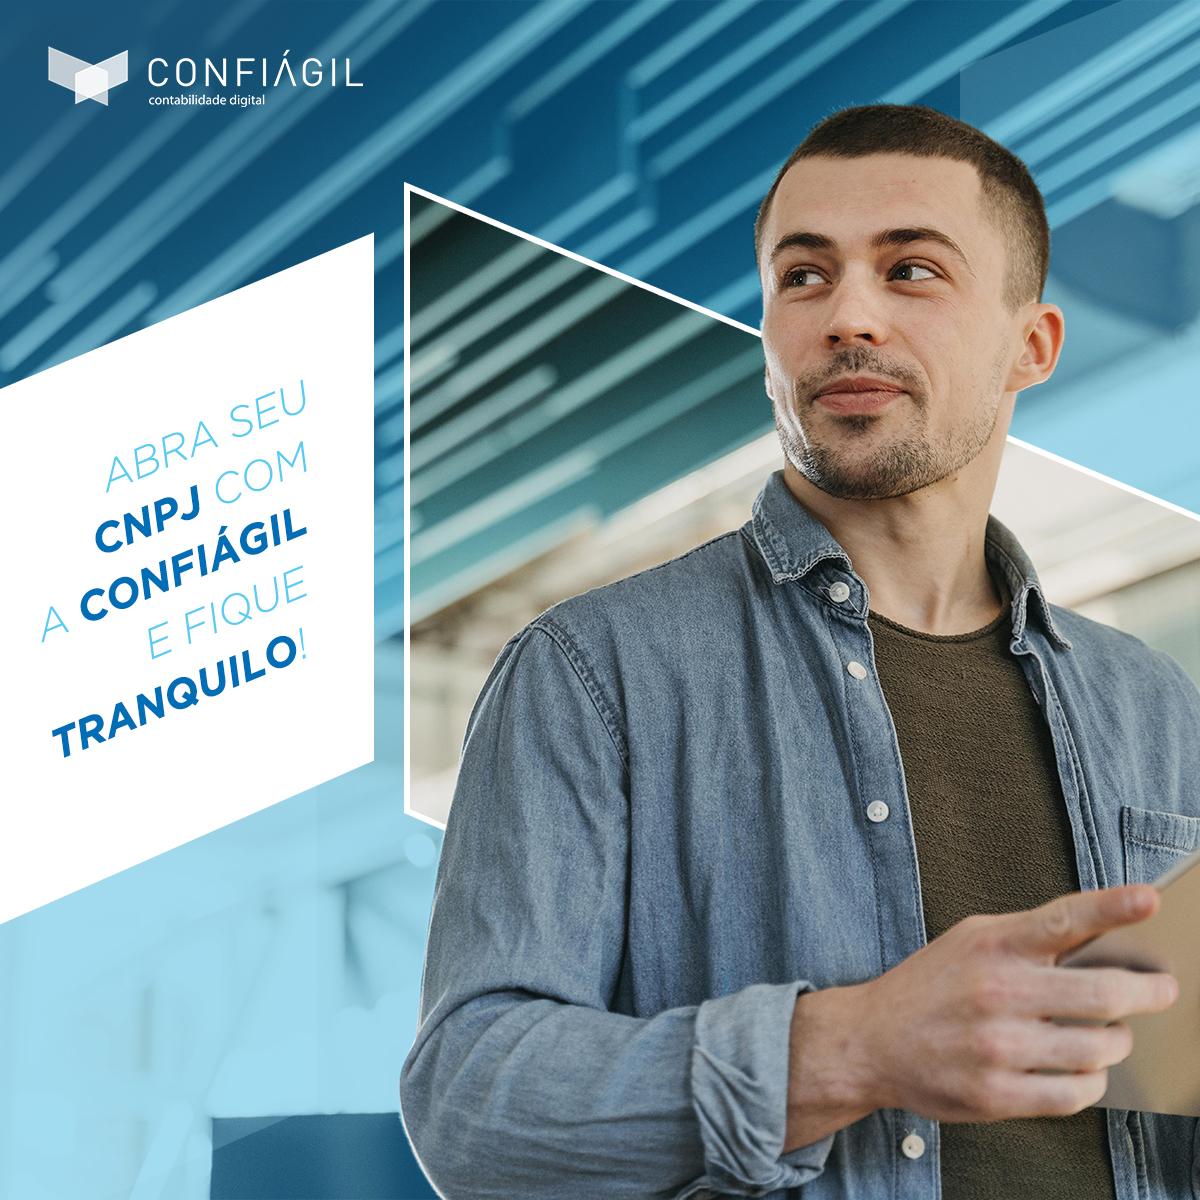 Read more about the article Abra seu CNPJ com a Confiágil e fique tranquilo